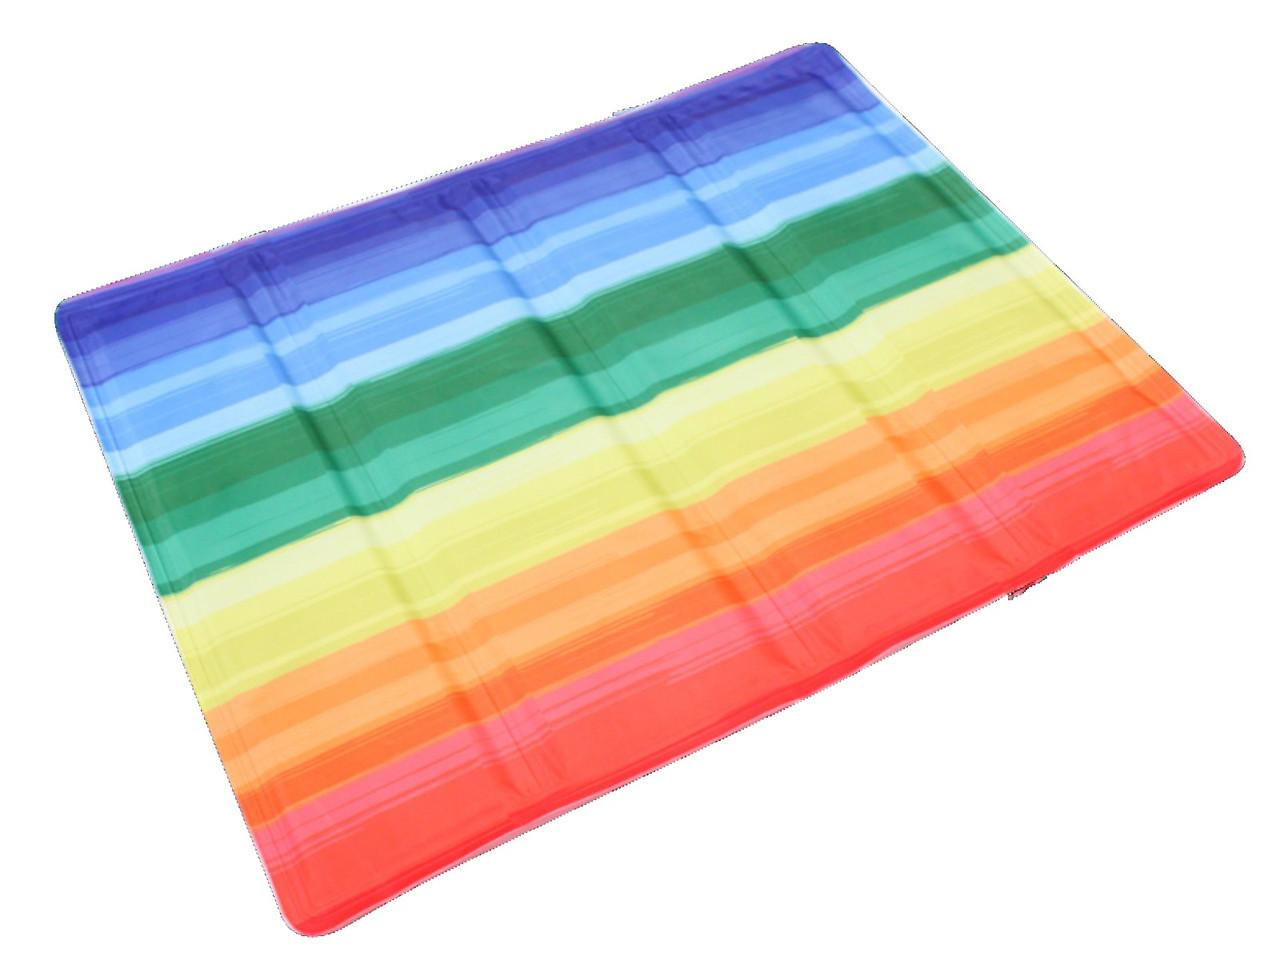 Охлаждающий коврик для собак Радуга 65х50 см, Croci